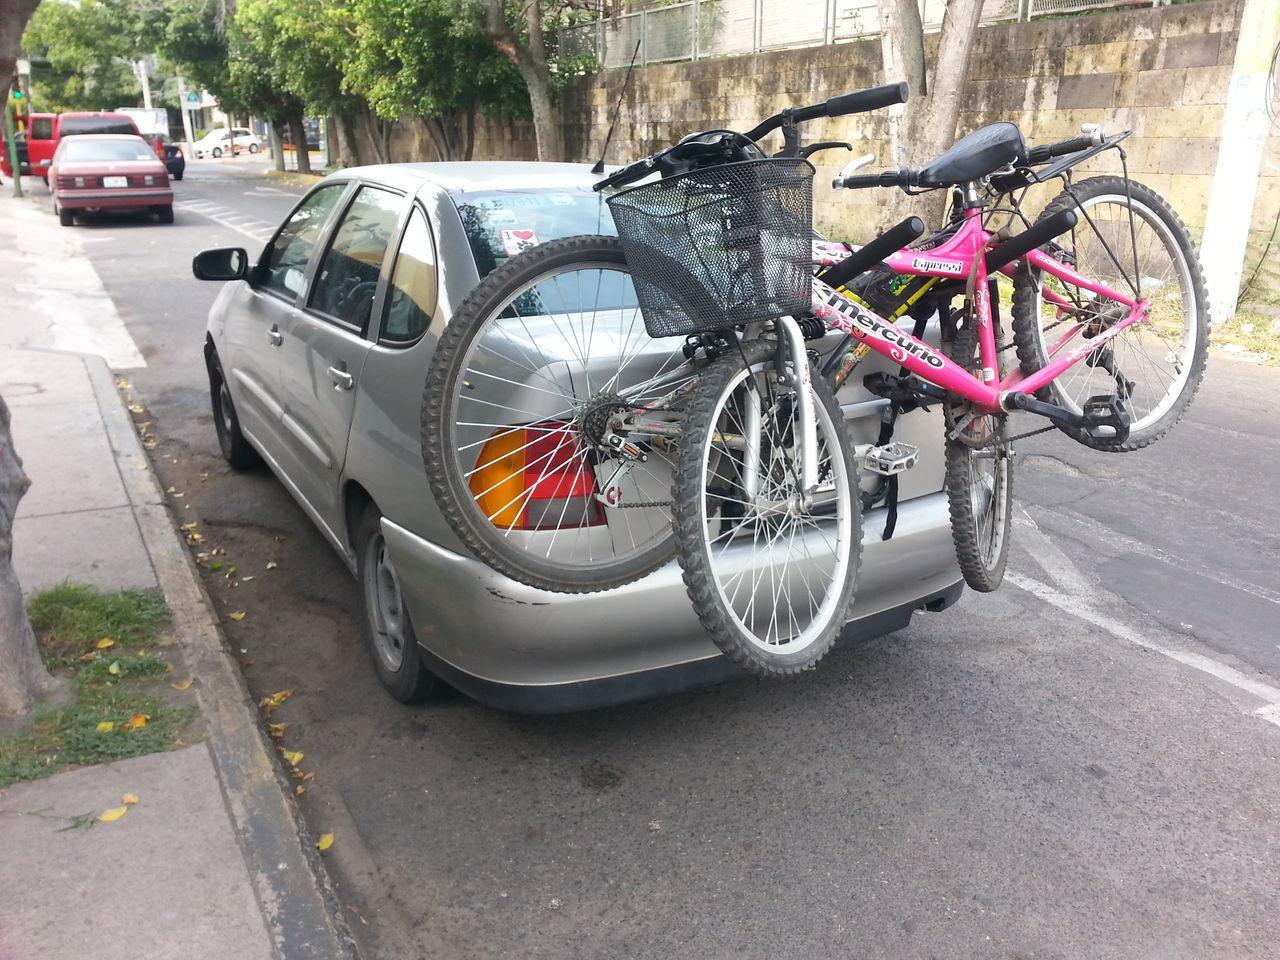 Via Recreactiva Guadalajara Jalisco Deporte Ciclovia  Bicicleteando